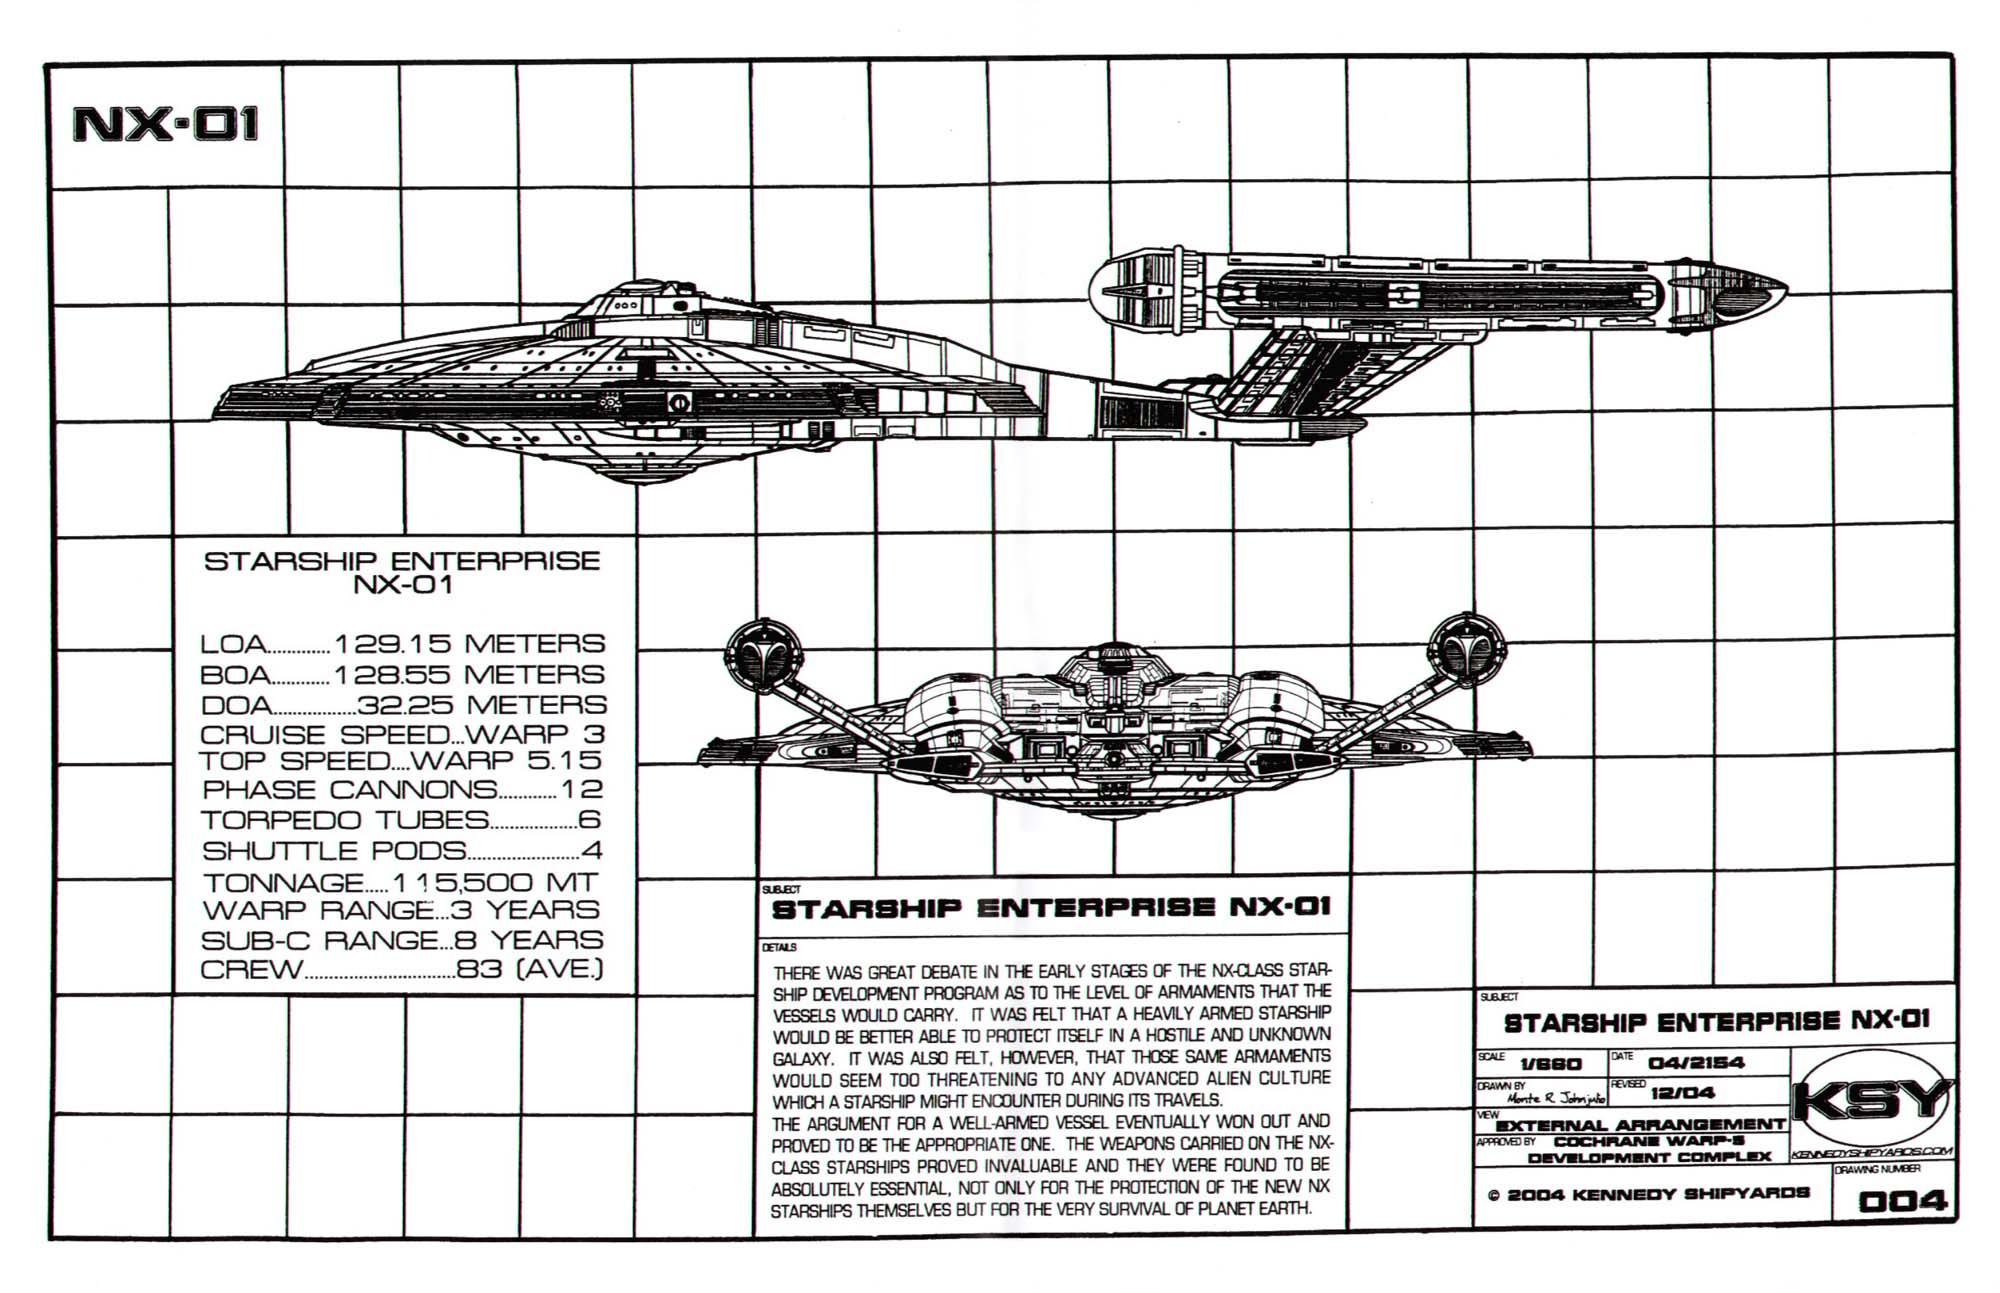 Star Trek Blueprints: Starfleet Vessel Enterprise NX-01